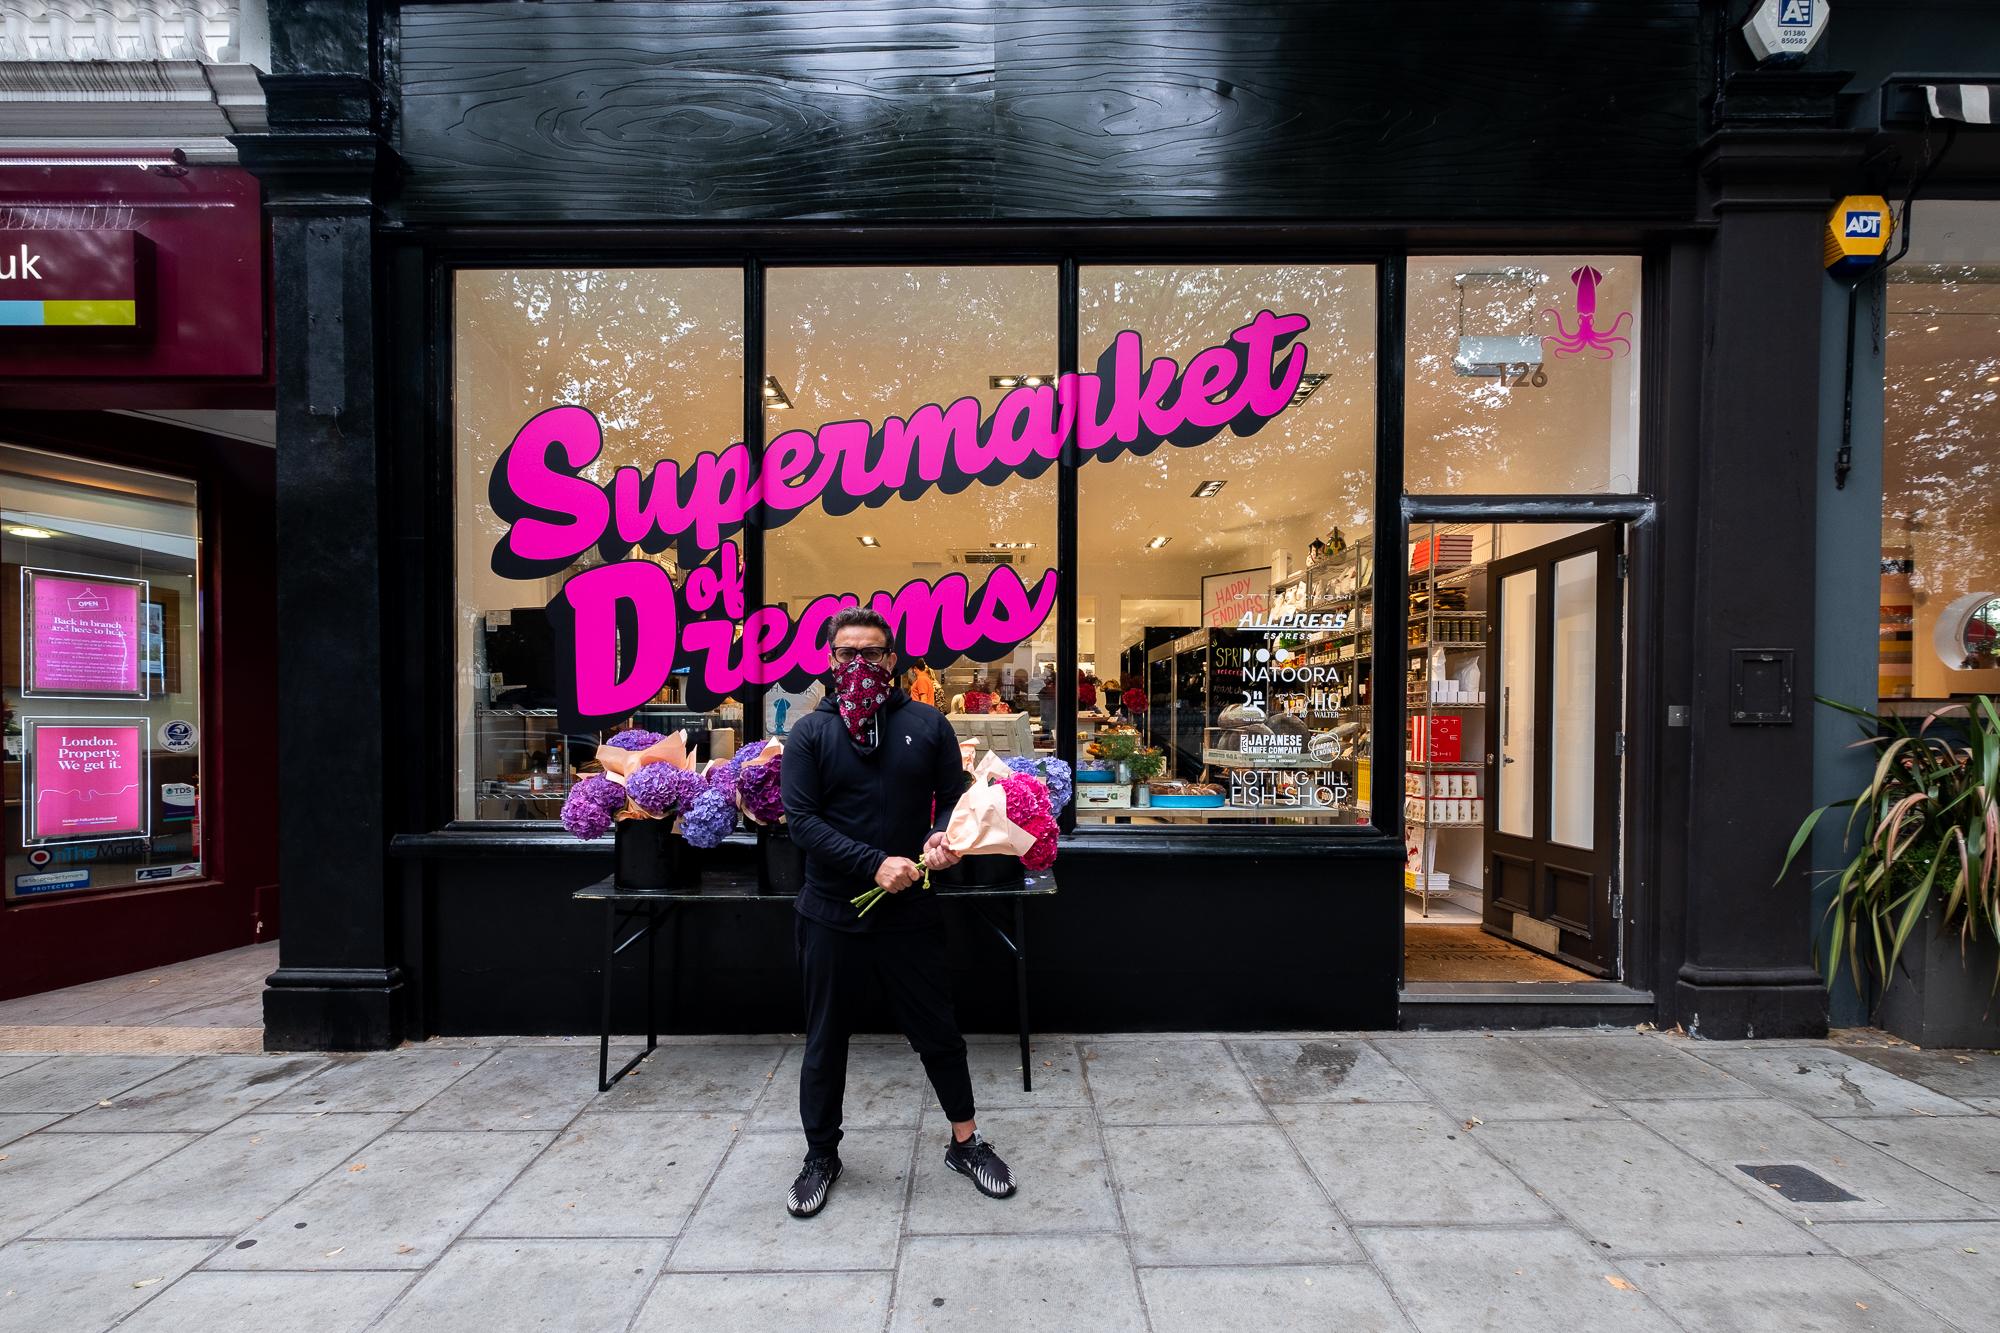 Notting Hill Fish Shop, shop, essential retail, Pop up, Fishmonger, Supermarket of Dreams